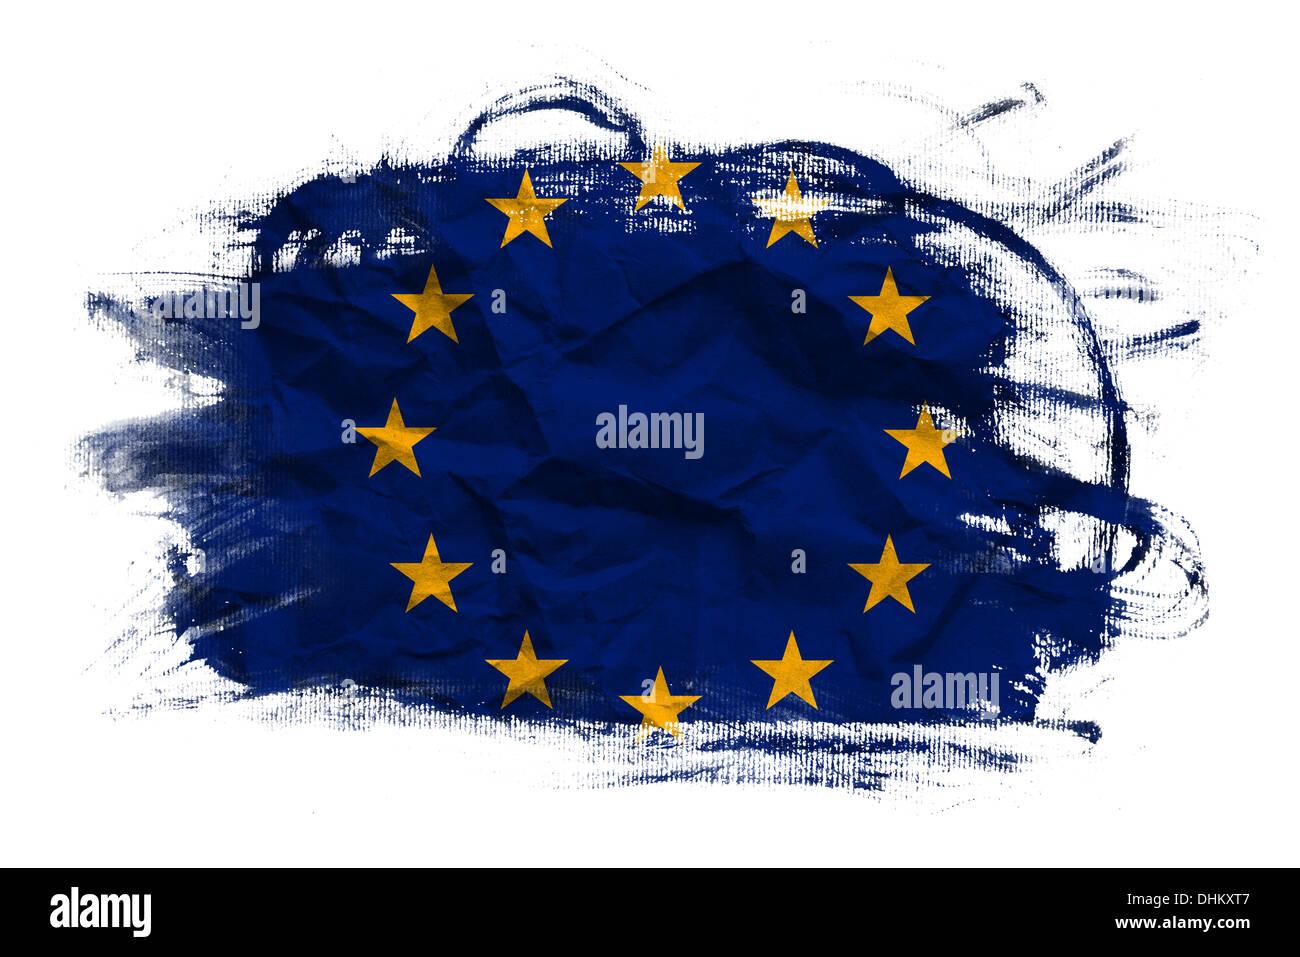 EU-Flagge auf zerknüllte Papier Textur. Alten Recyclingpapier Hintergrund. Stockbild